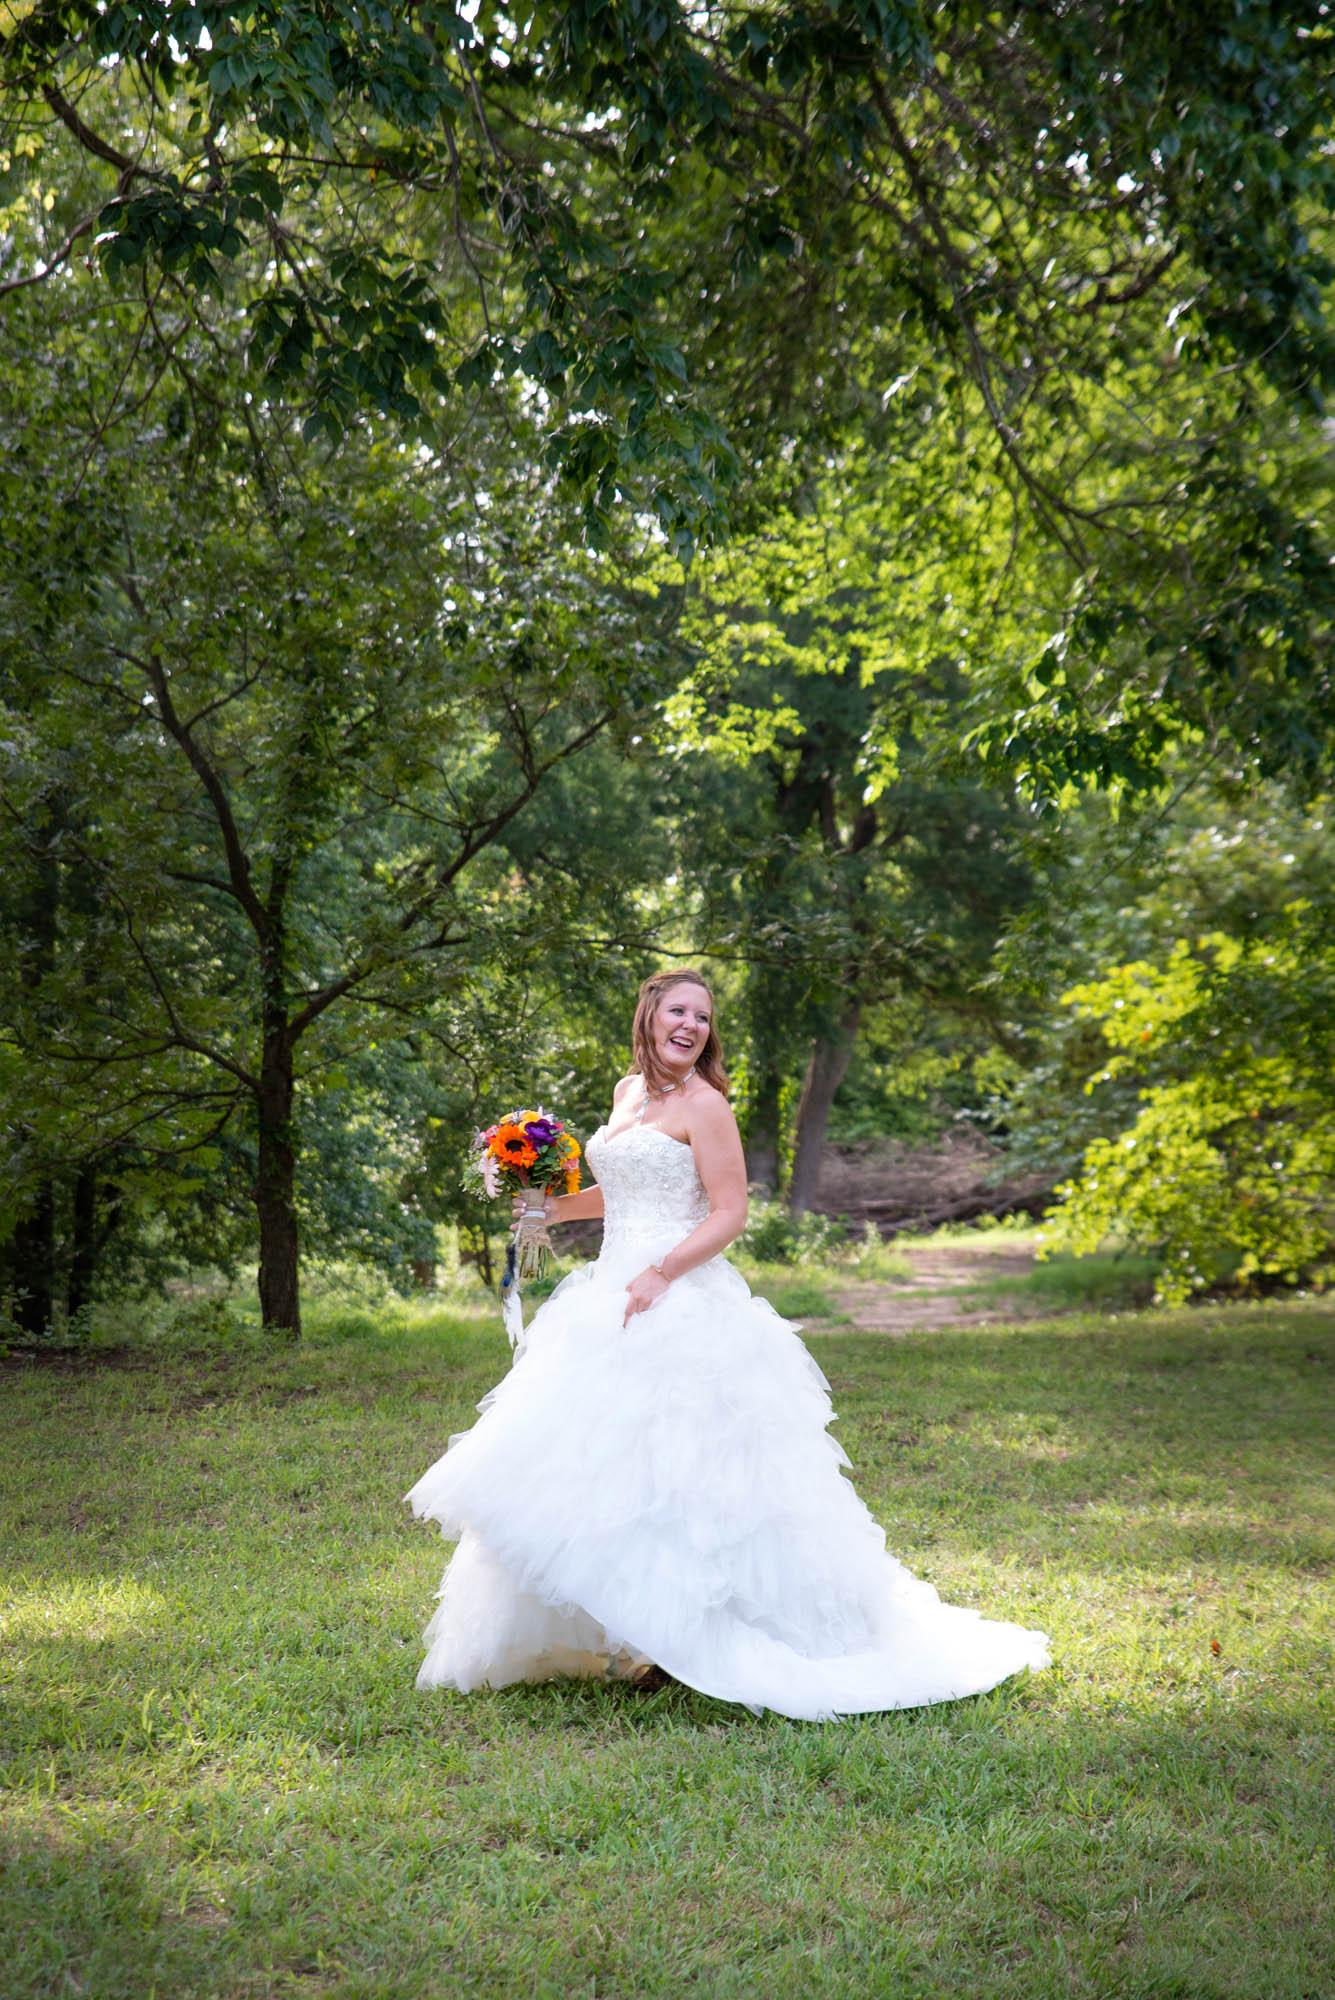 Stephanie Ray Wedding PhotographyDSC_4129w.jpg